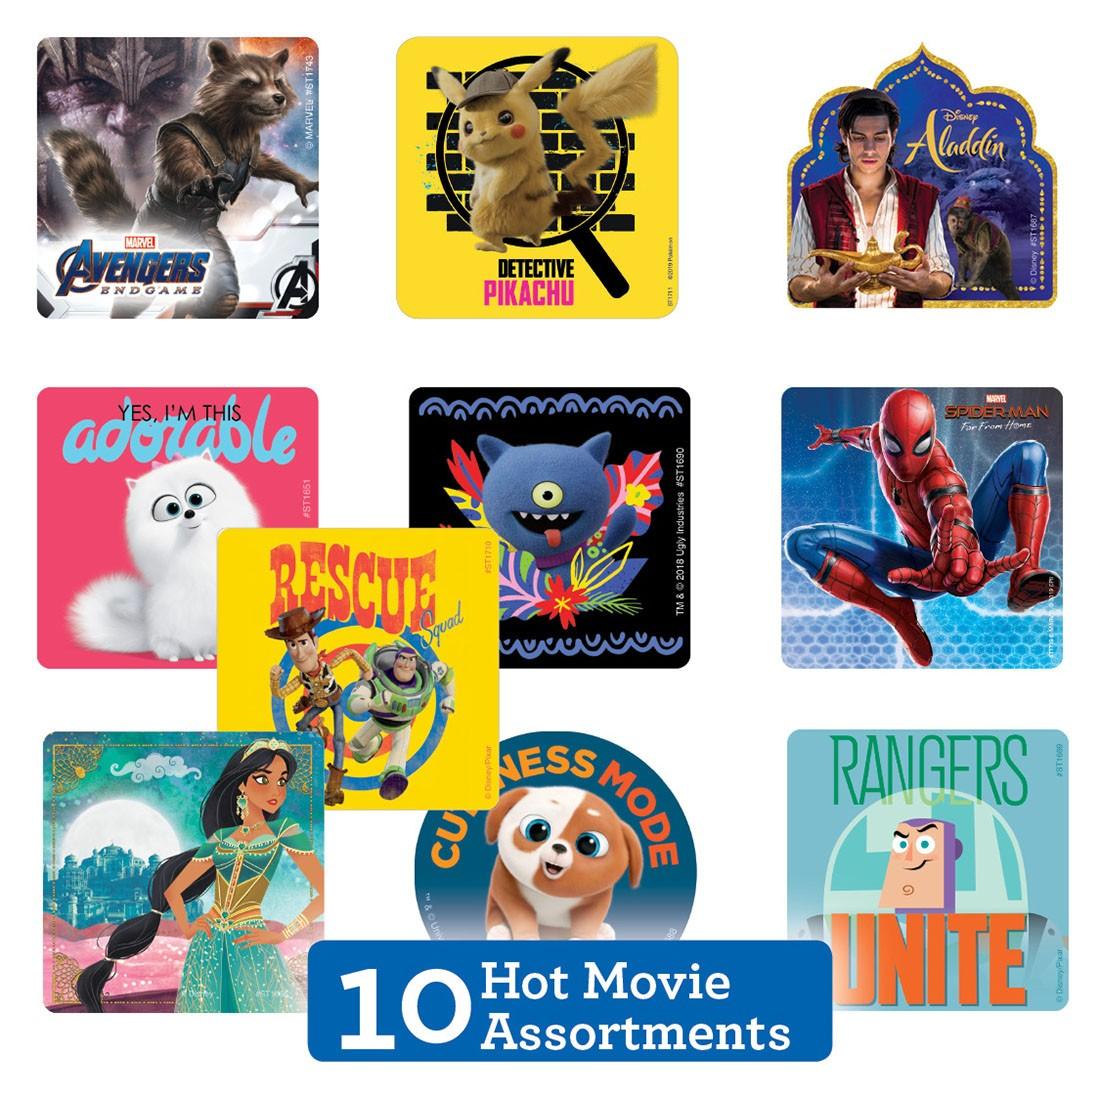 Hot Summer Movie Sticker Sampler  [image]